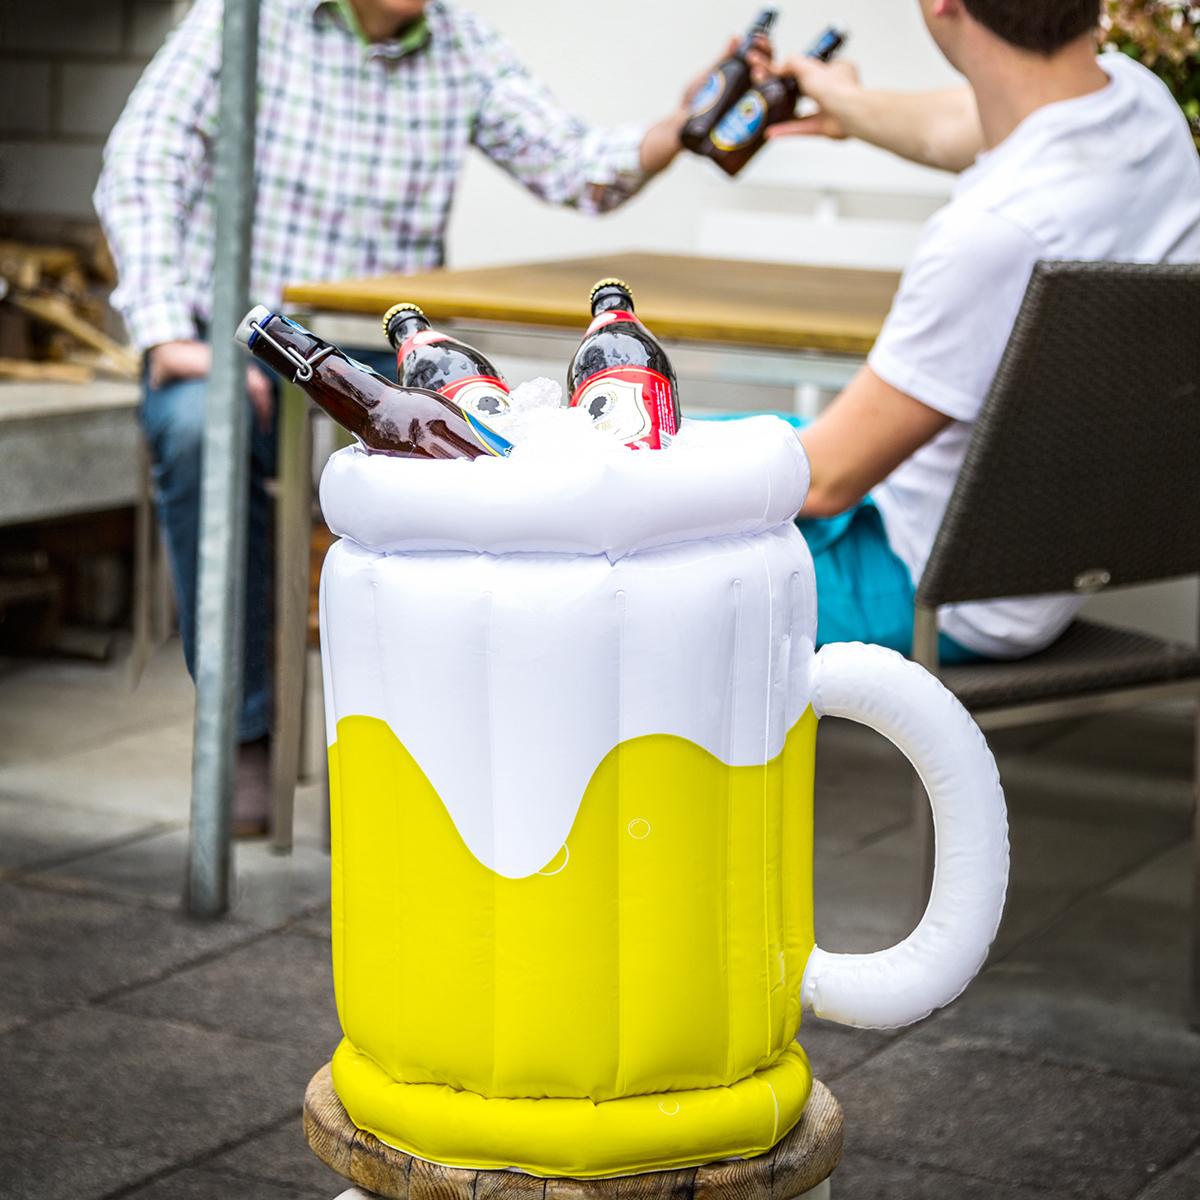 Aufblasbarer Bierkühler - Maßkrug